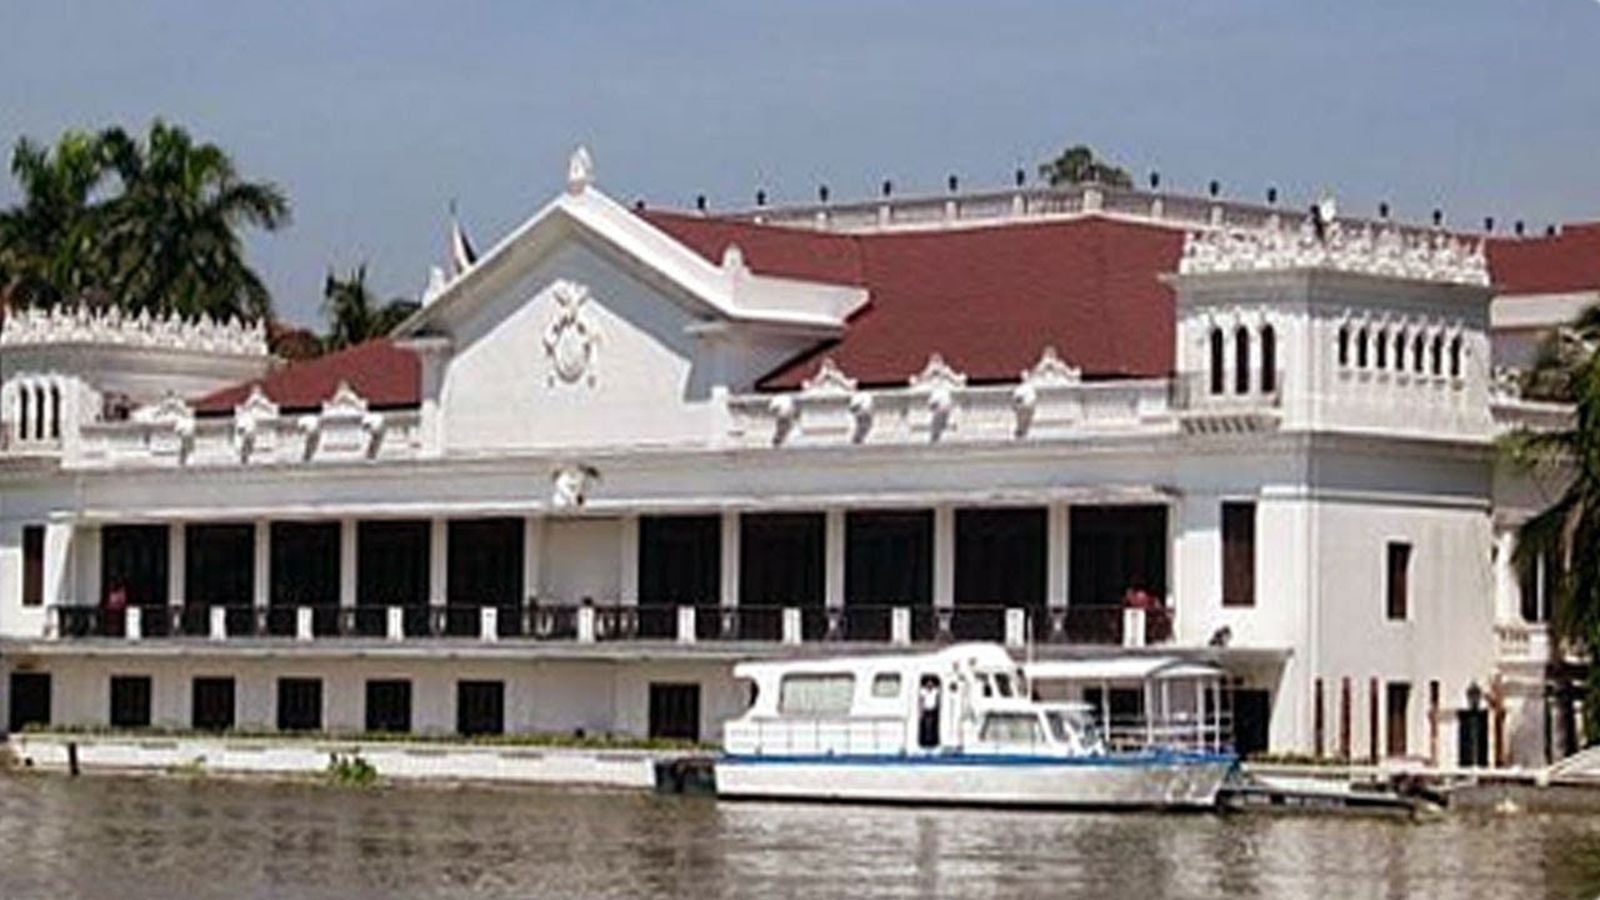 PHILIPPINEN REISEN - KULTUR - HISTORISCHE ORTE UND PLÄTZE - Malacanan Palast